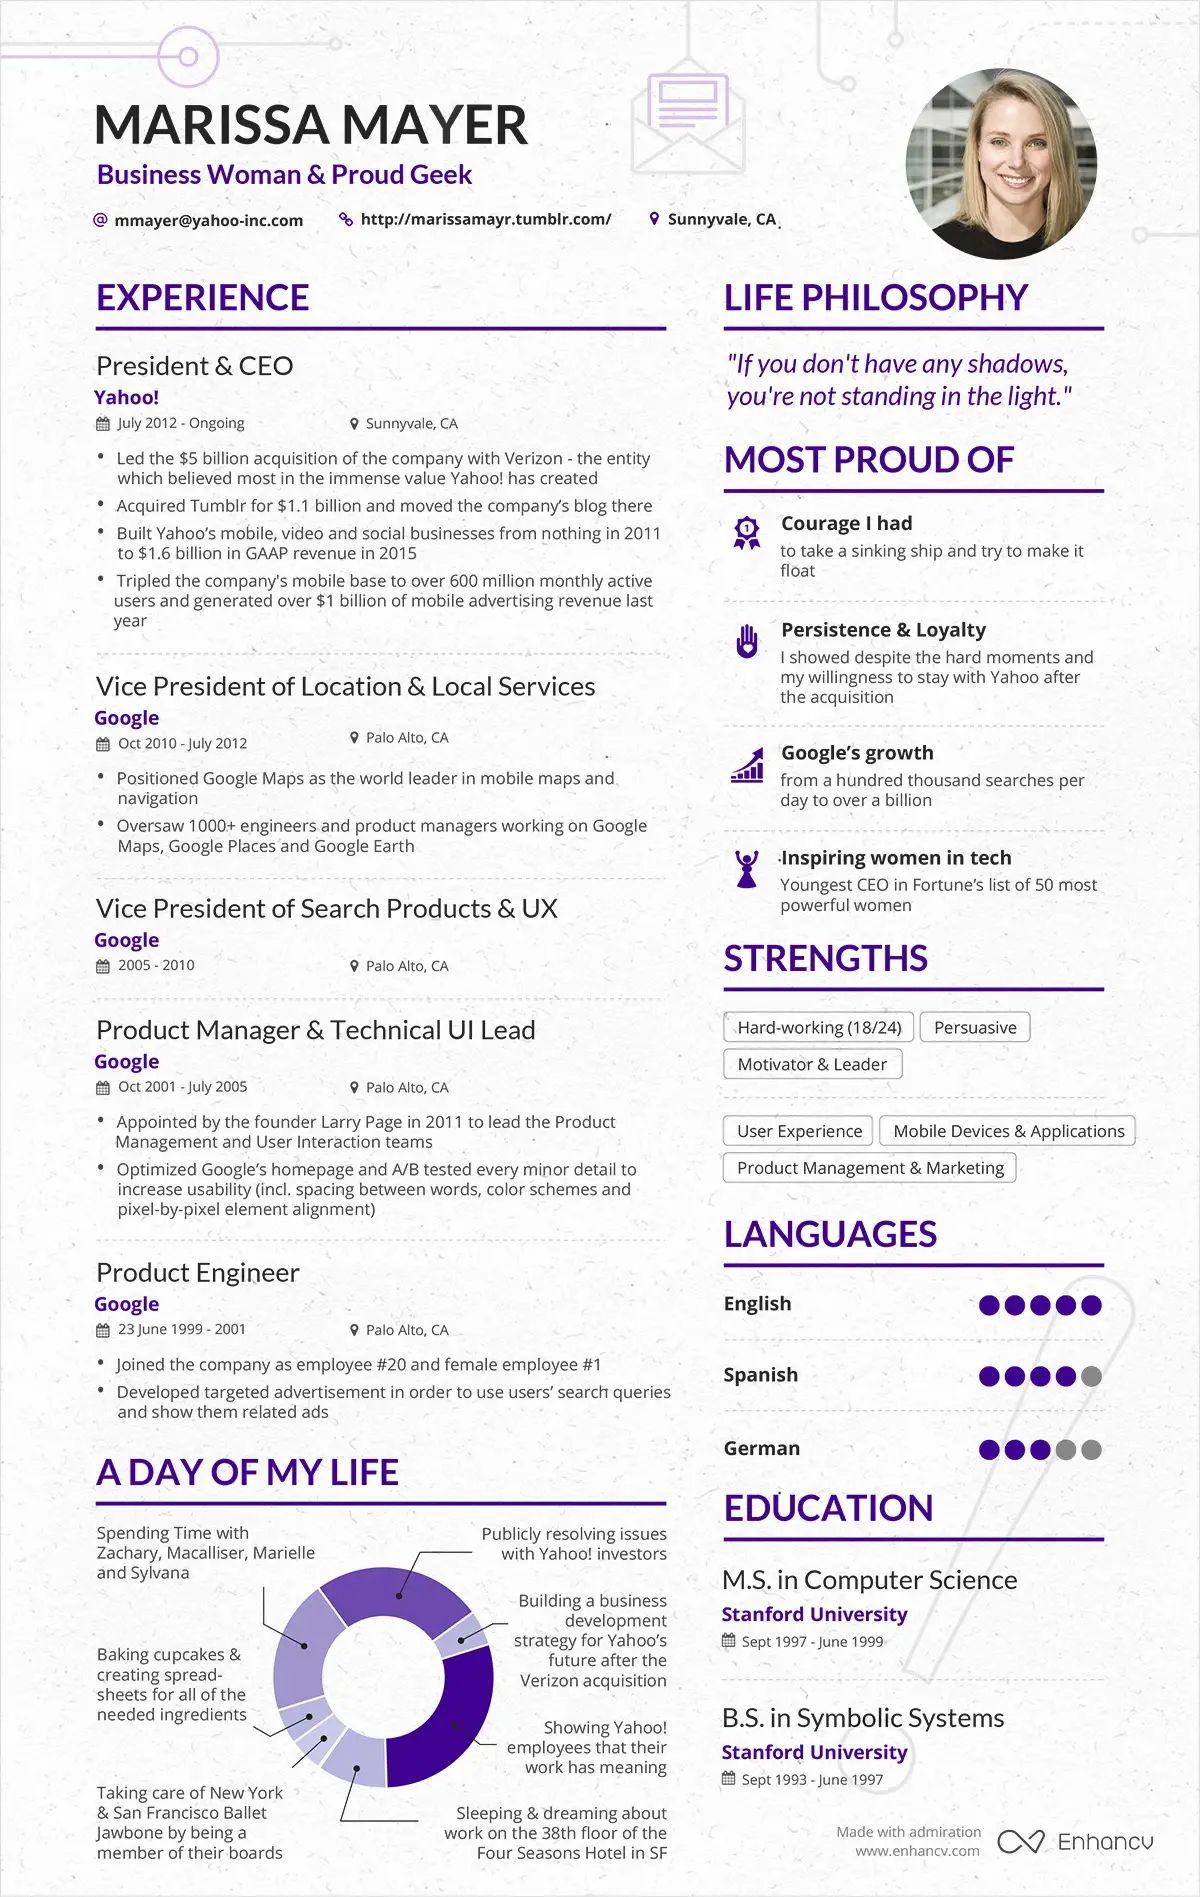 resume template like marissa mayer